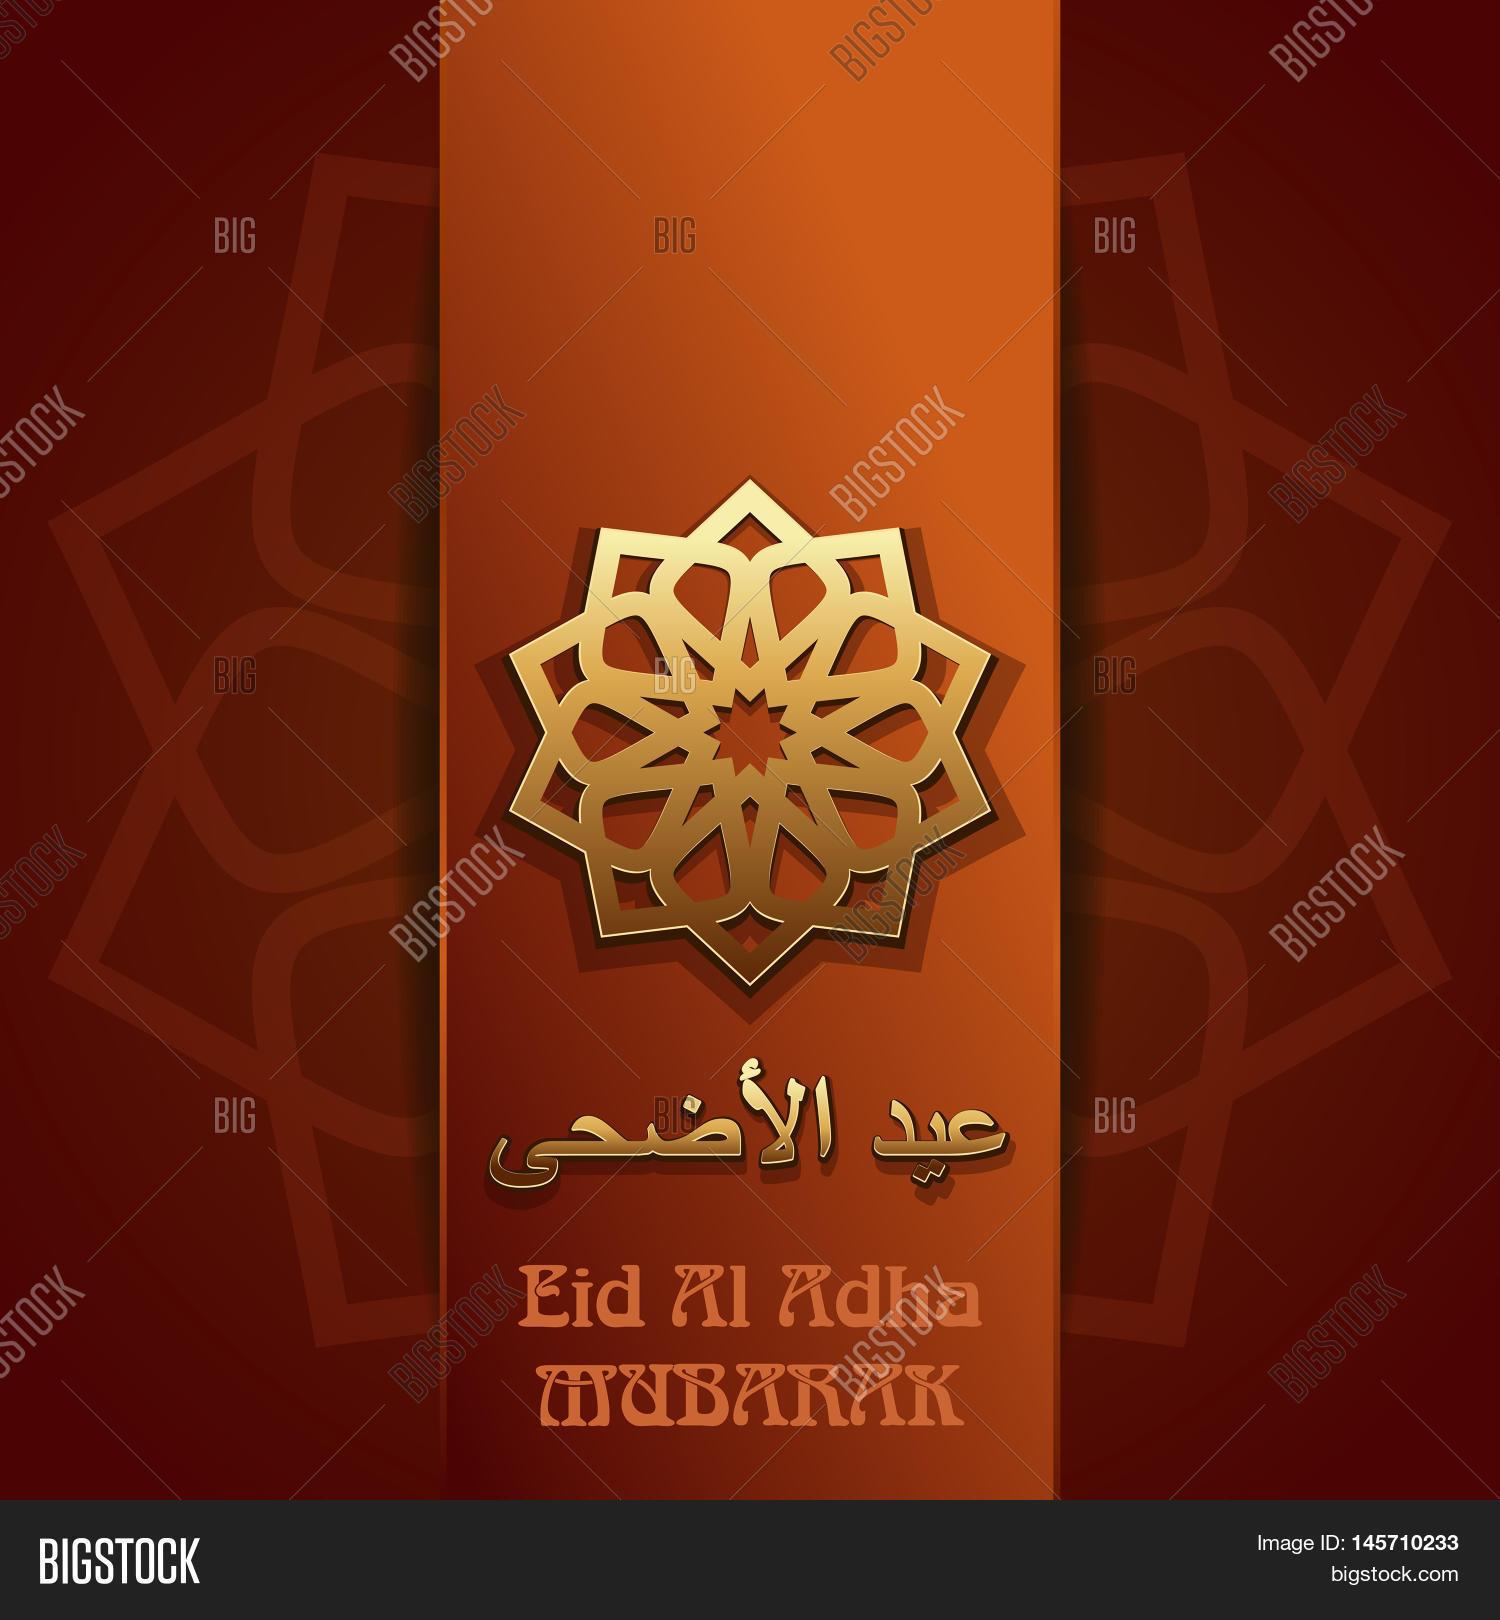 Greeting card muslim image photo free trial bigstock greeting card for muslim community festival eid ul adha celebrations with gold inscription in m4hsunfo